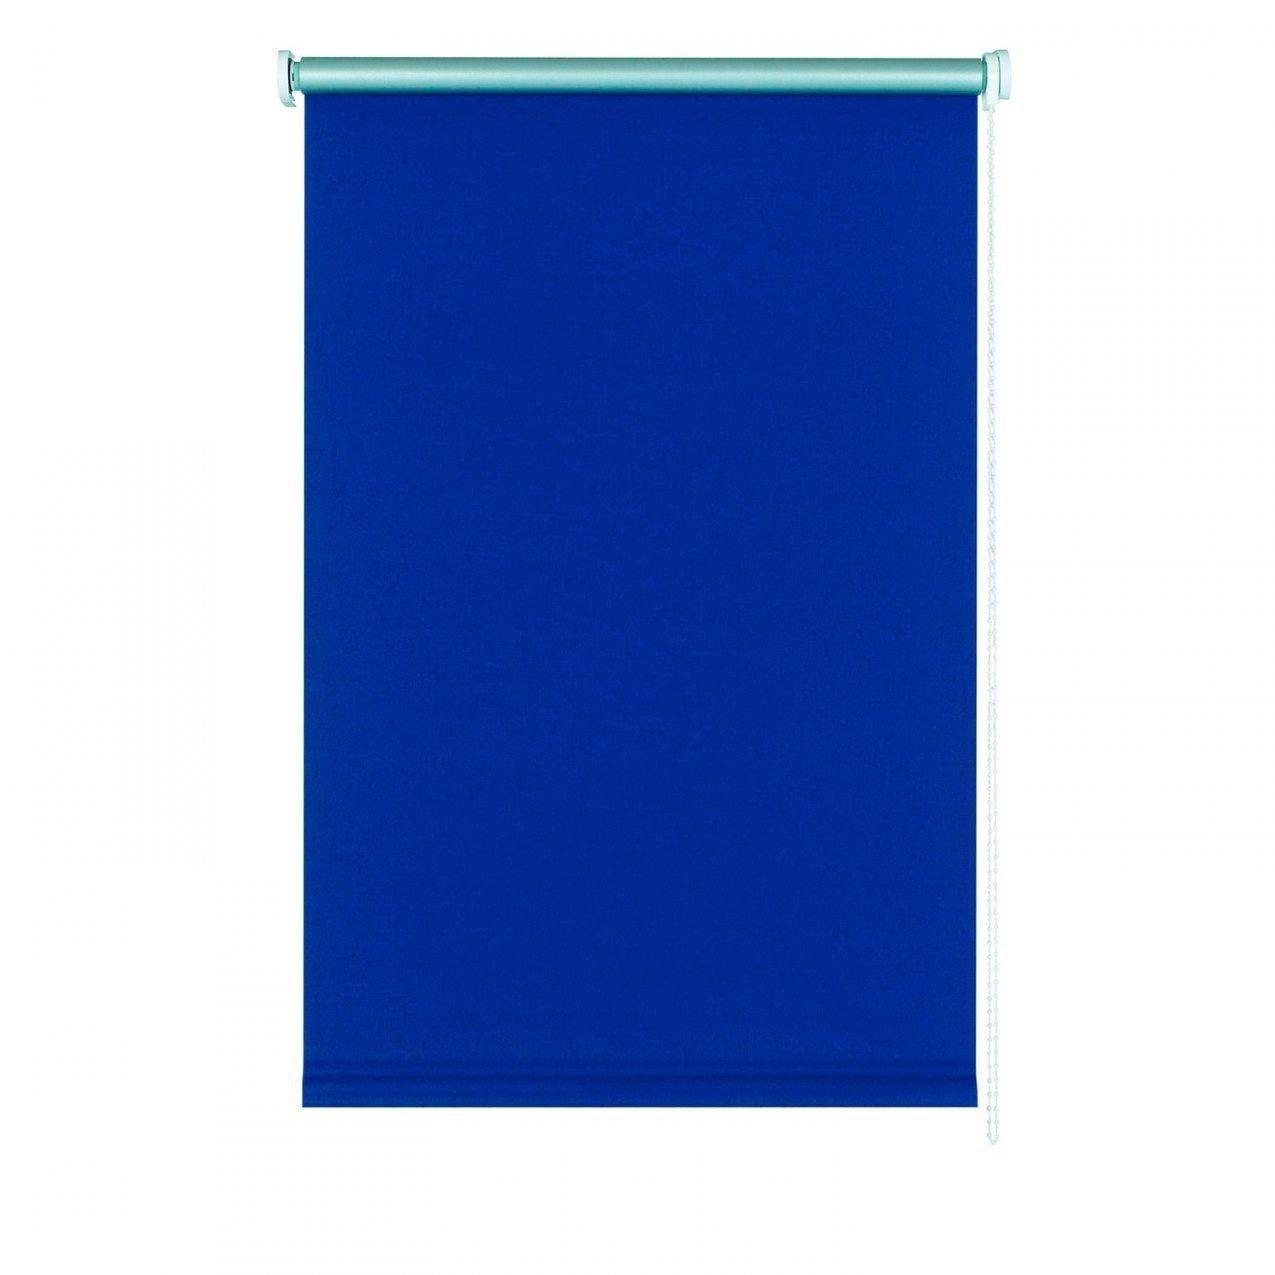 Gardinia Verdunkelungsrollo Thermo 162 Cm X 180 Cm Marineblau Kaufen von Verdunkelungsrollo 180 Cm Breit Photo